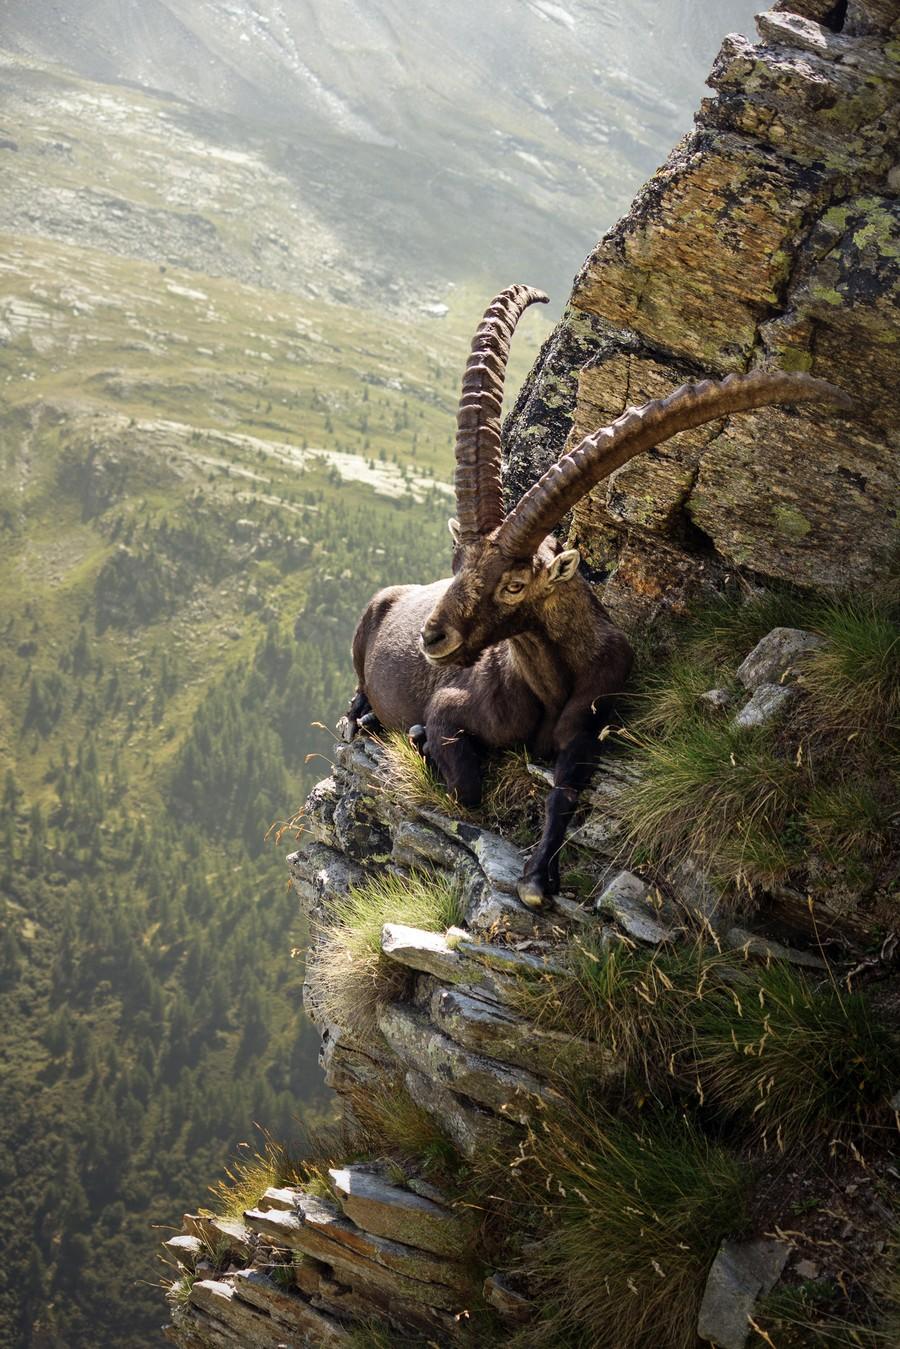 Goat on cliff edge illusion / Goat on cliff edge illusion /1199384